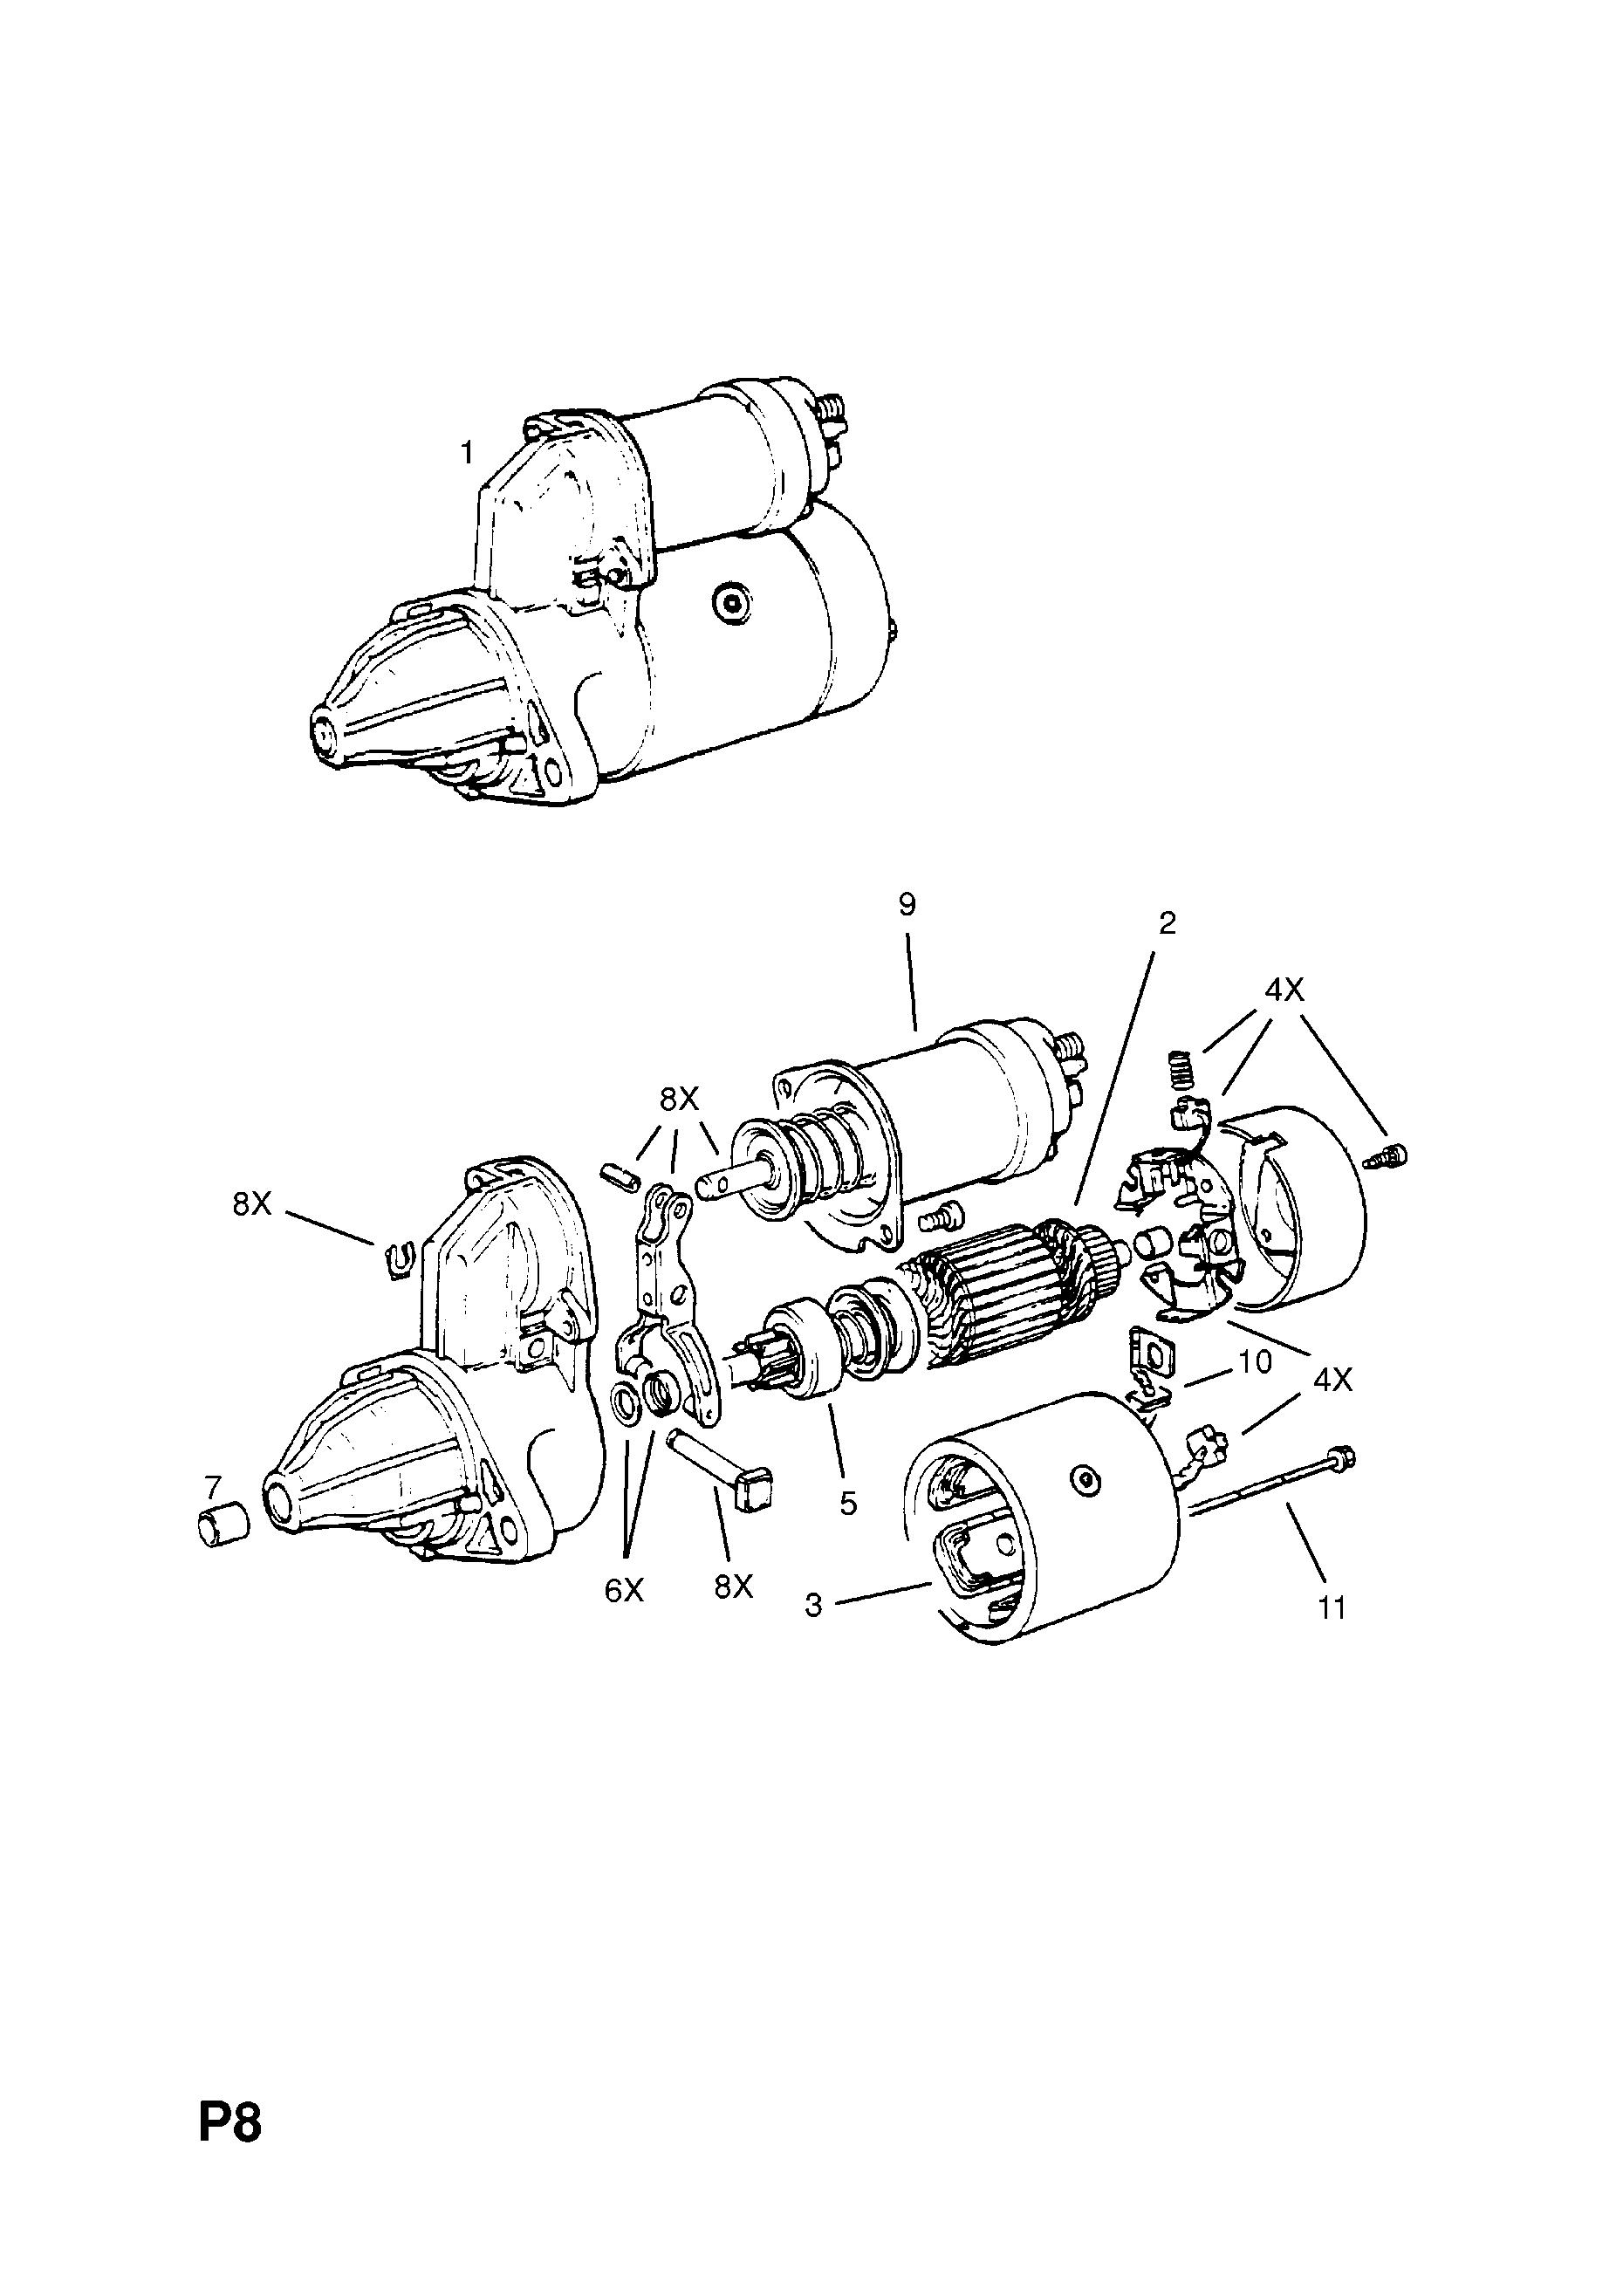 opel corsa-a ( 1983 - 1992), p electrical, 1 engine and cooling, 119.13s[lx9 ],13nb[ly1],13sb[lx9],c13n[l72] petrol engines - catcar.info  catcar.info